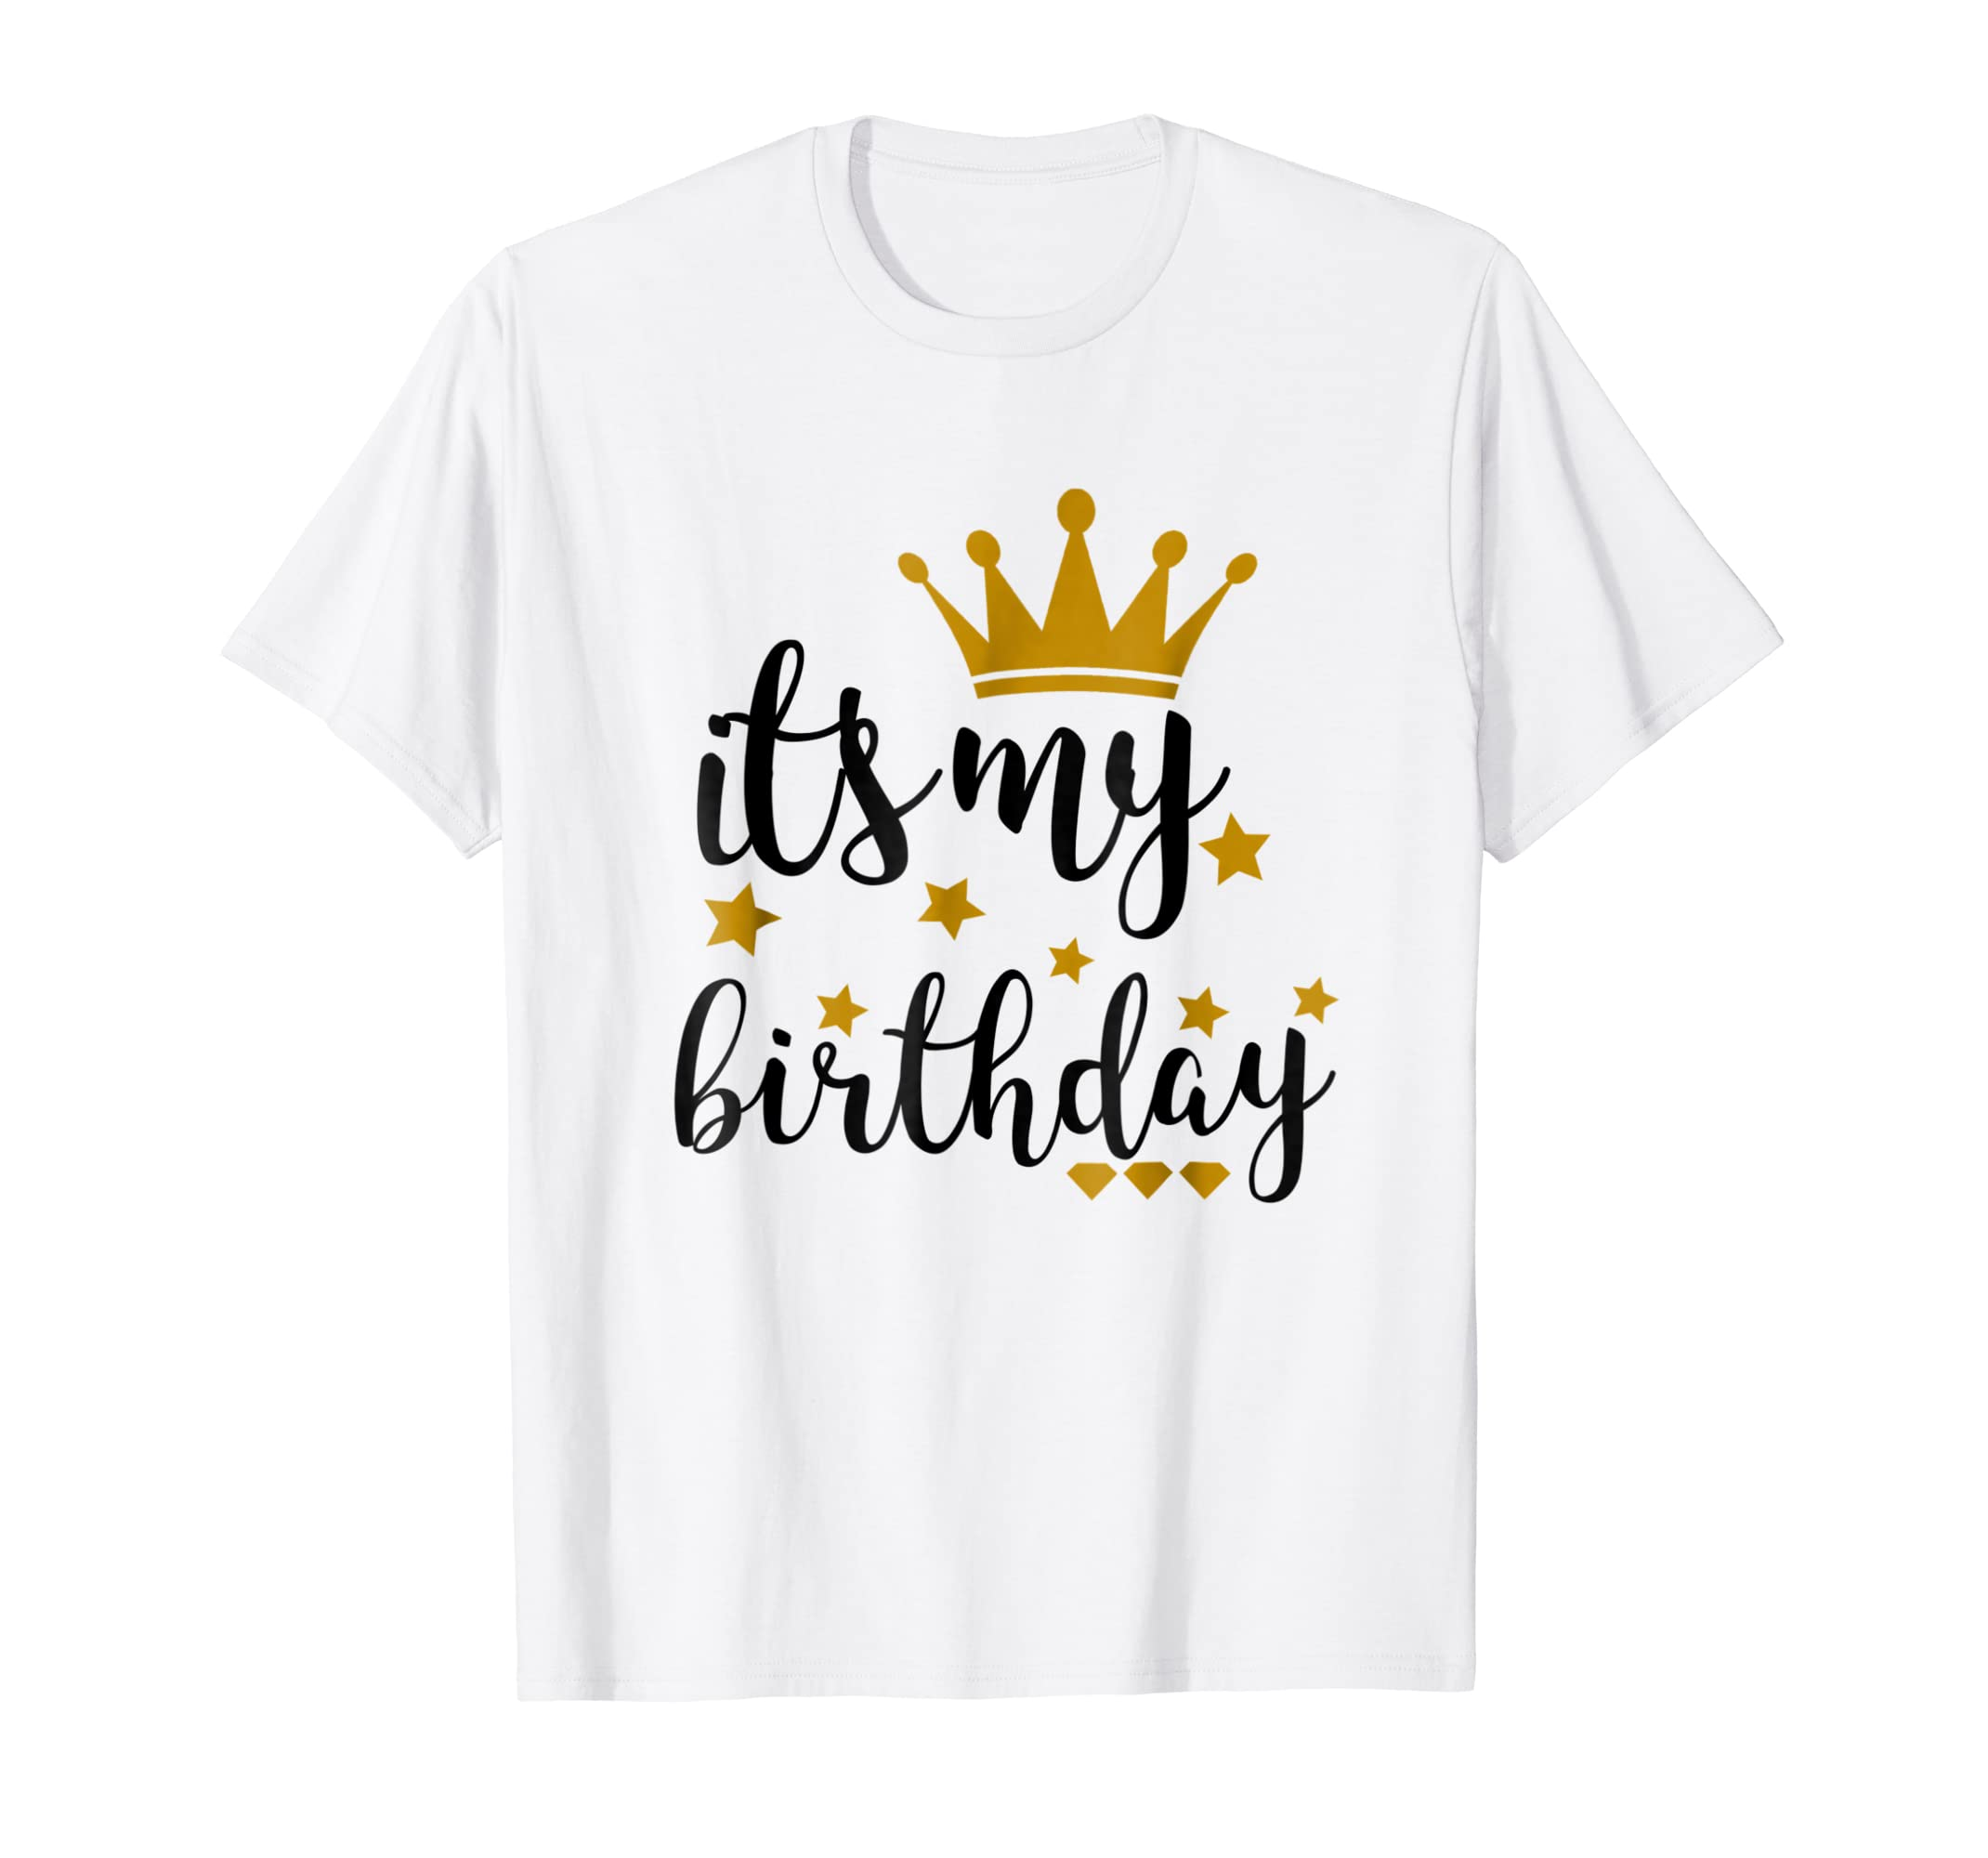 Amazon Its My Birthday Shirt For Women Teens Girls Black Gold Clothing